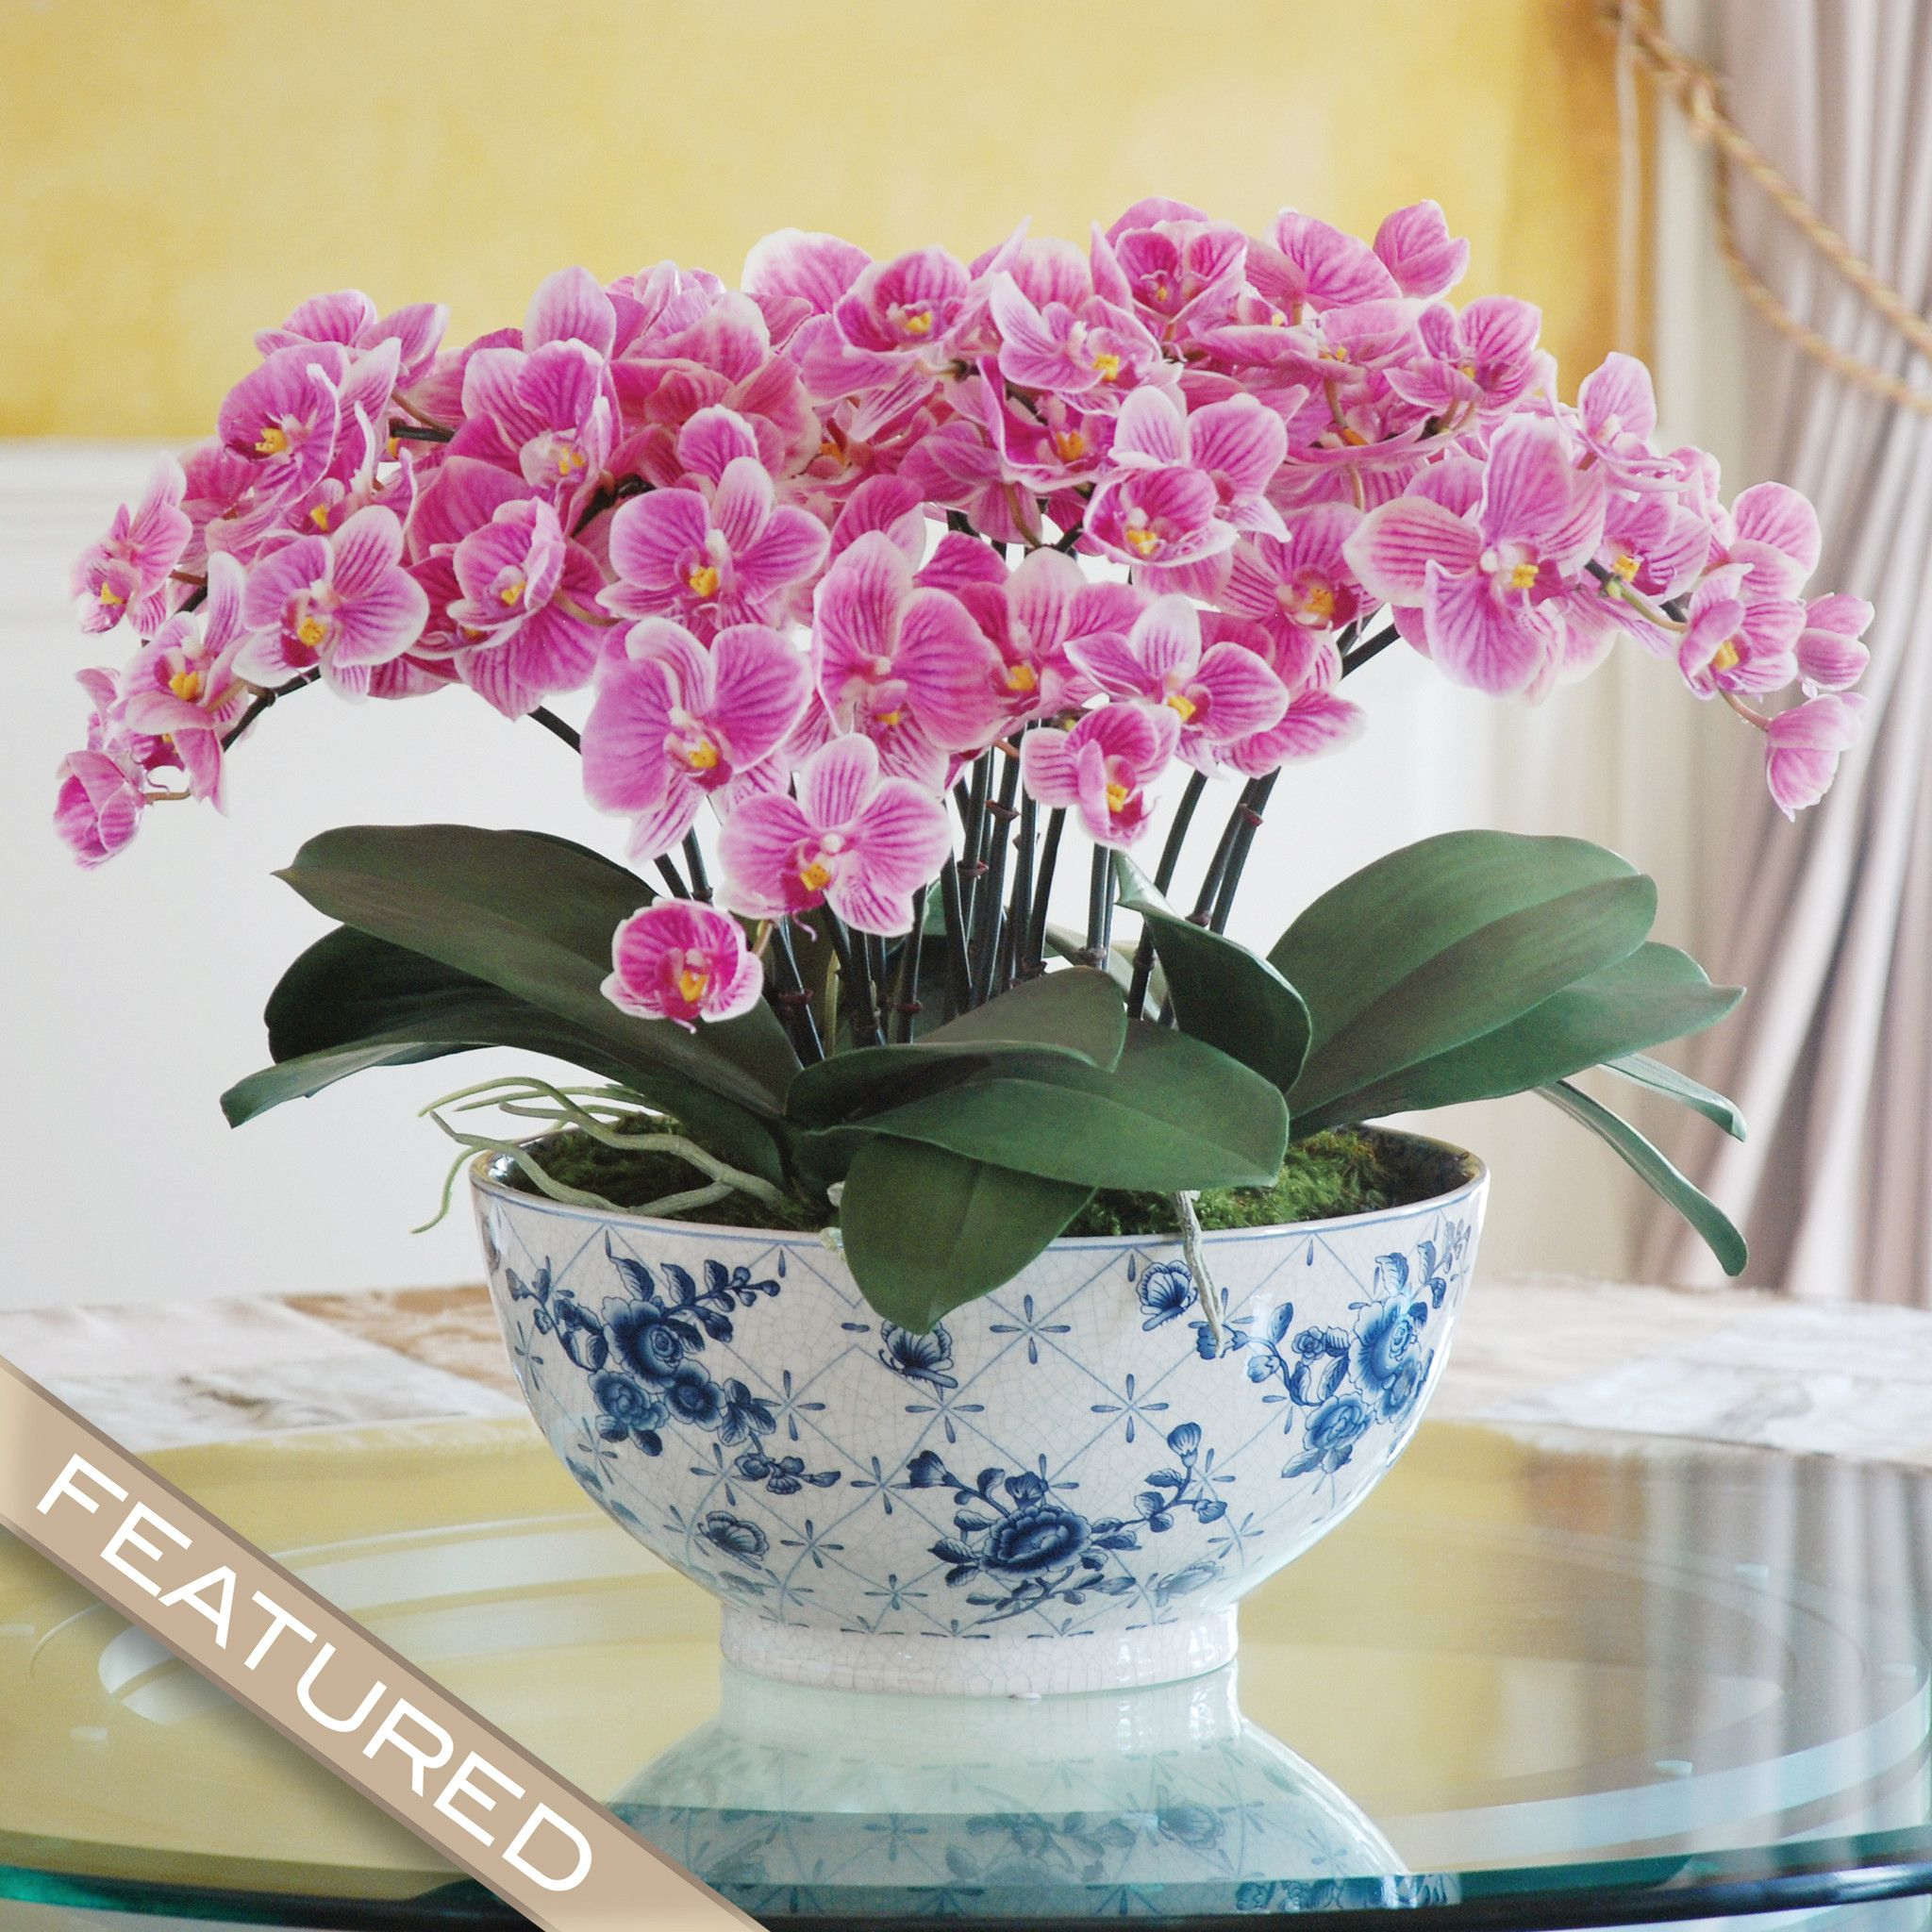 Orchid Flower Arrangements For Weddings: Eclectice Phalaenopsis Orchid Centerpiece (dp770-puwh